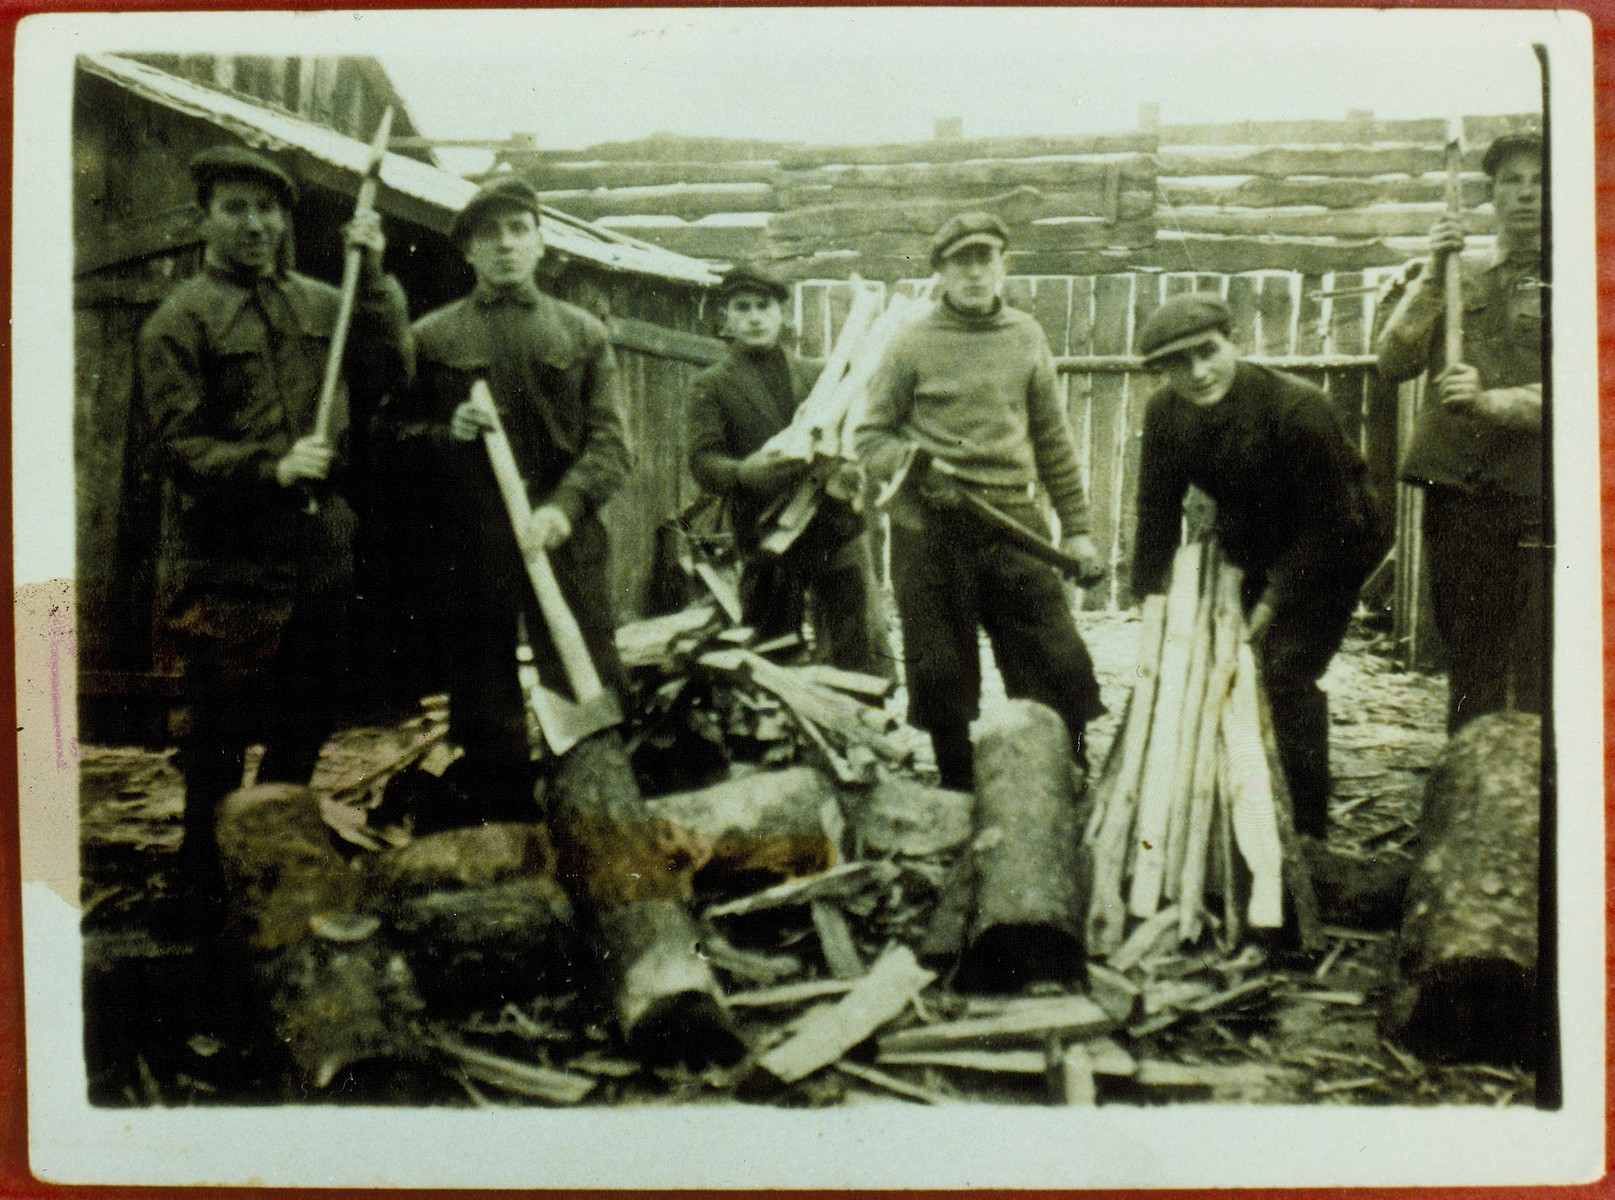 Members of a kibbutz hachshara from chop wood in a lumberyard.